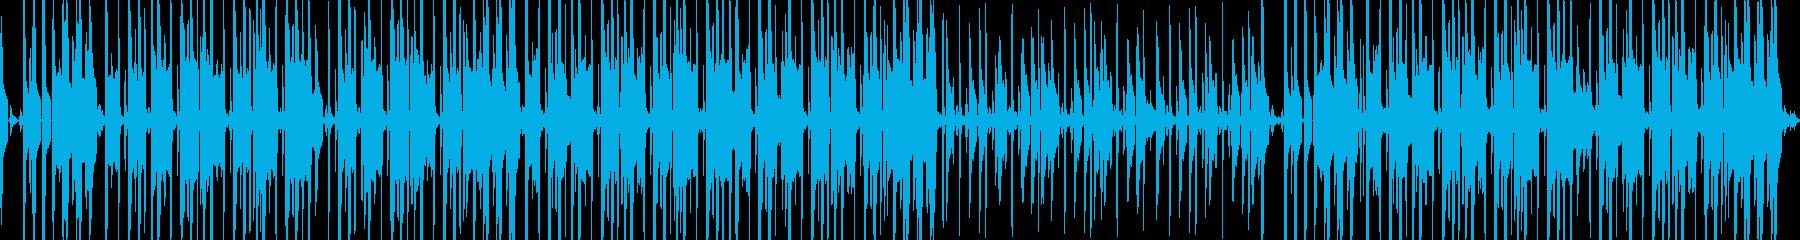 Hip hop groove urban's reproduced waveform